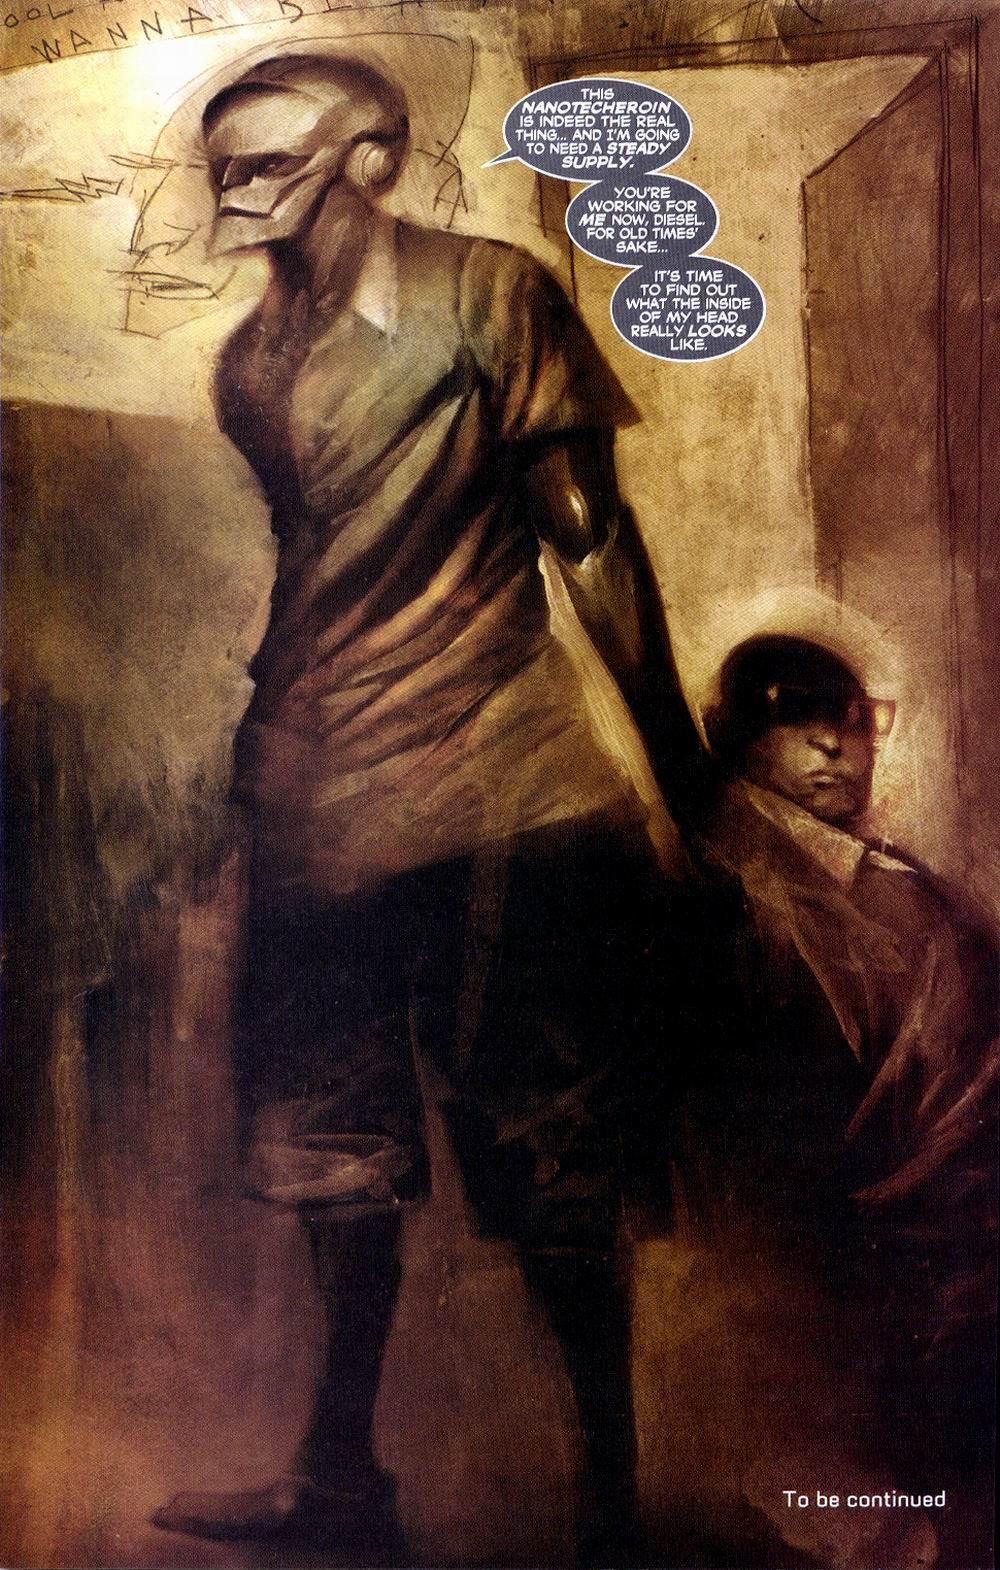 Read online Automatic Kafka comic -  Issue #1 - 25